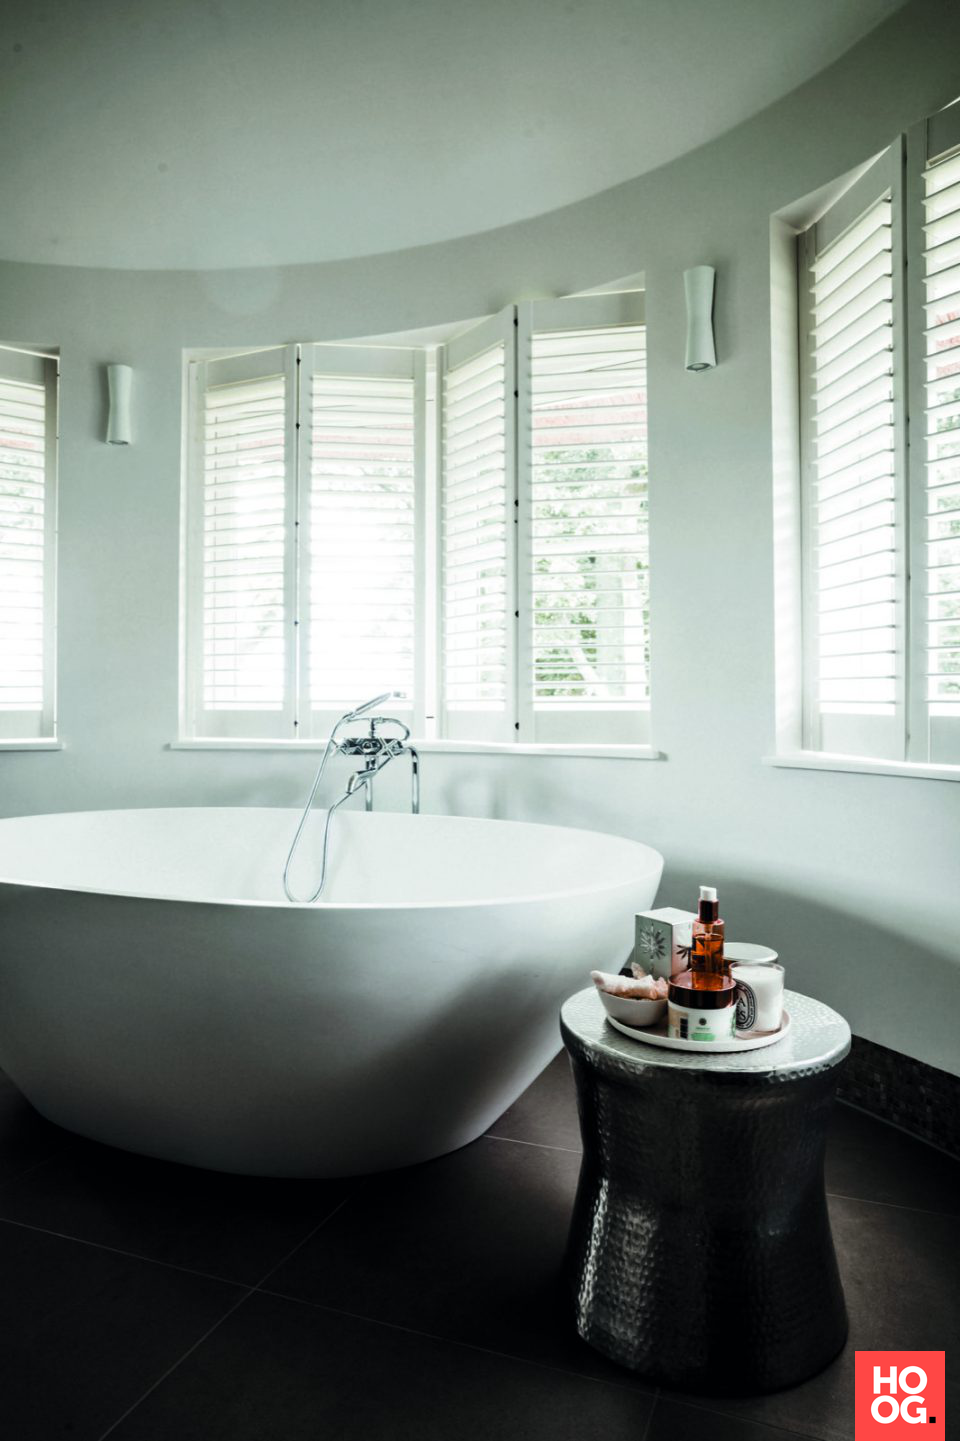 Bad ka design badkamer design met luxe ligbad  rietgedekte villa blaricum